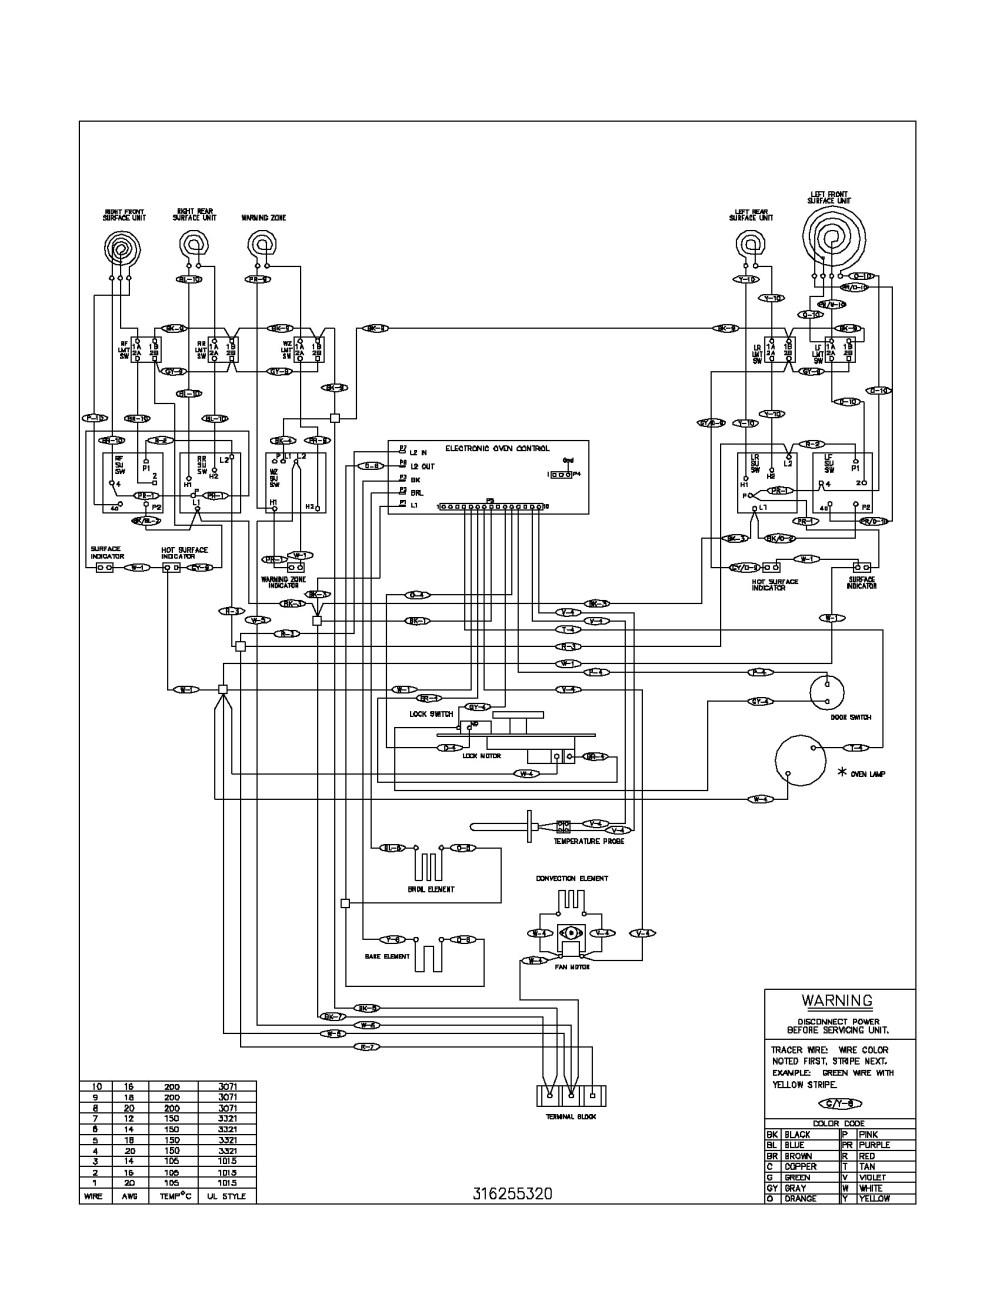 medium resolution of ge washer motor wiring diagram capacitor start motor schematic wiring diagram domestic of ge washer motor